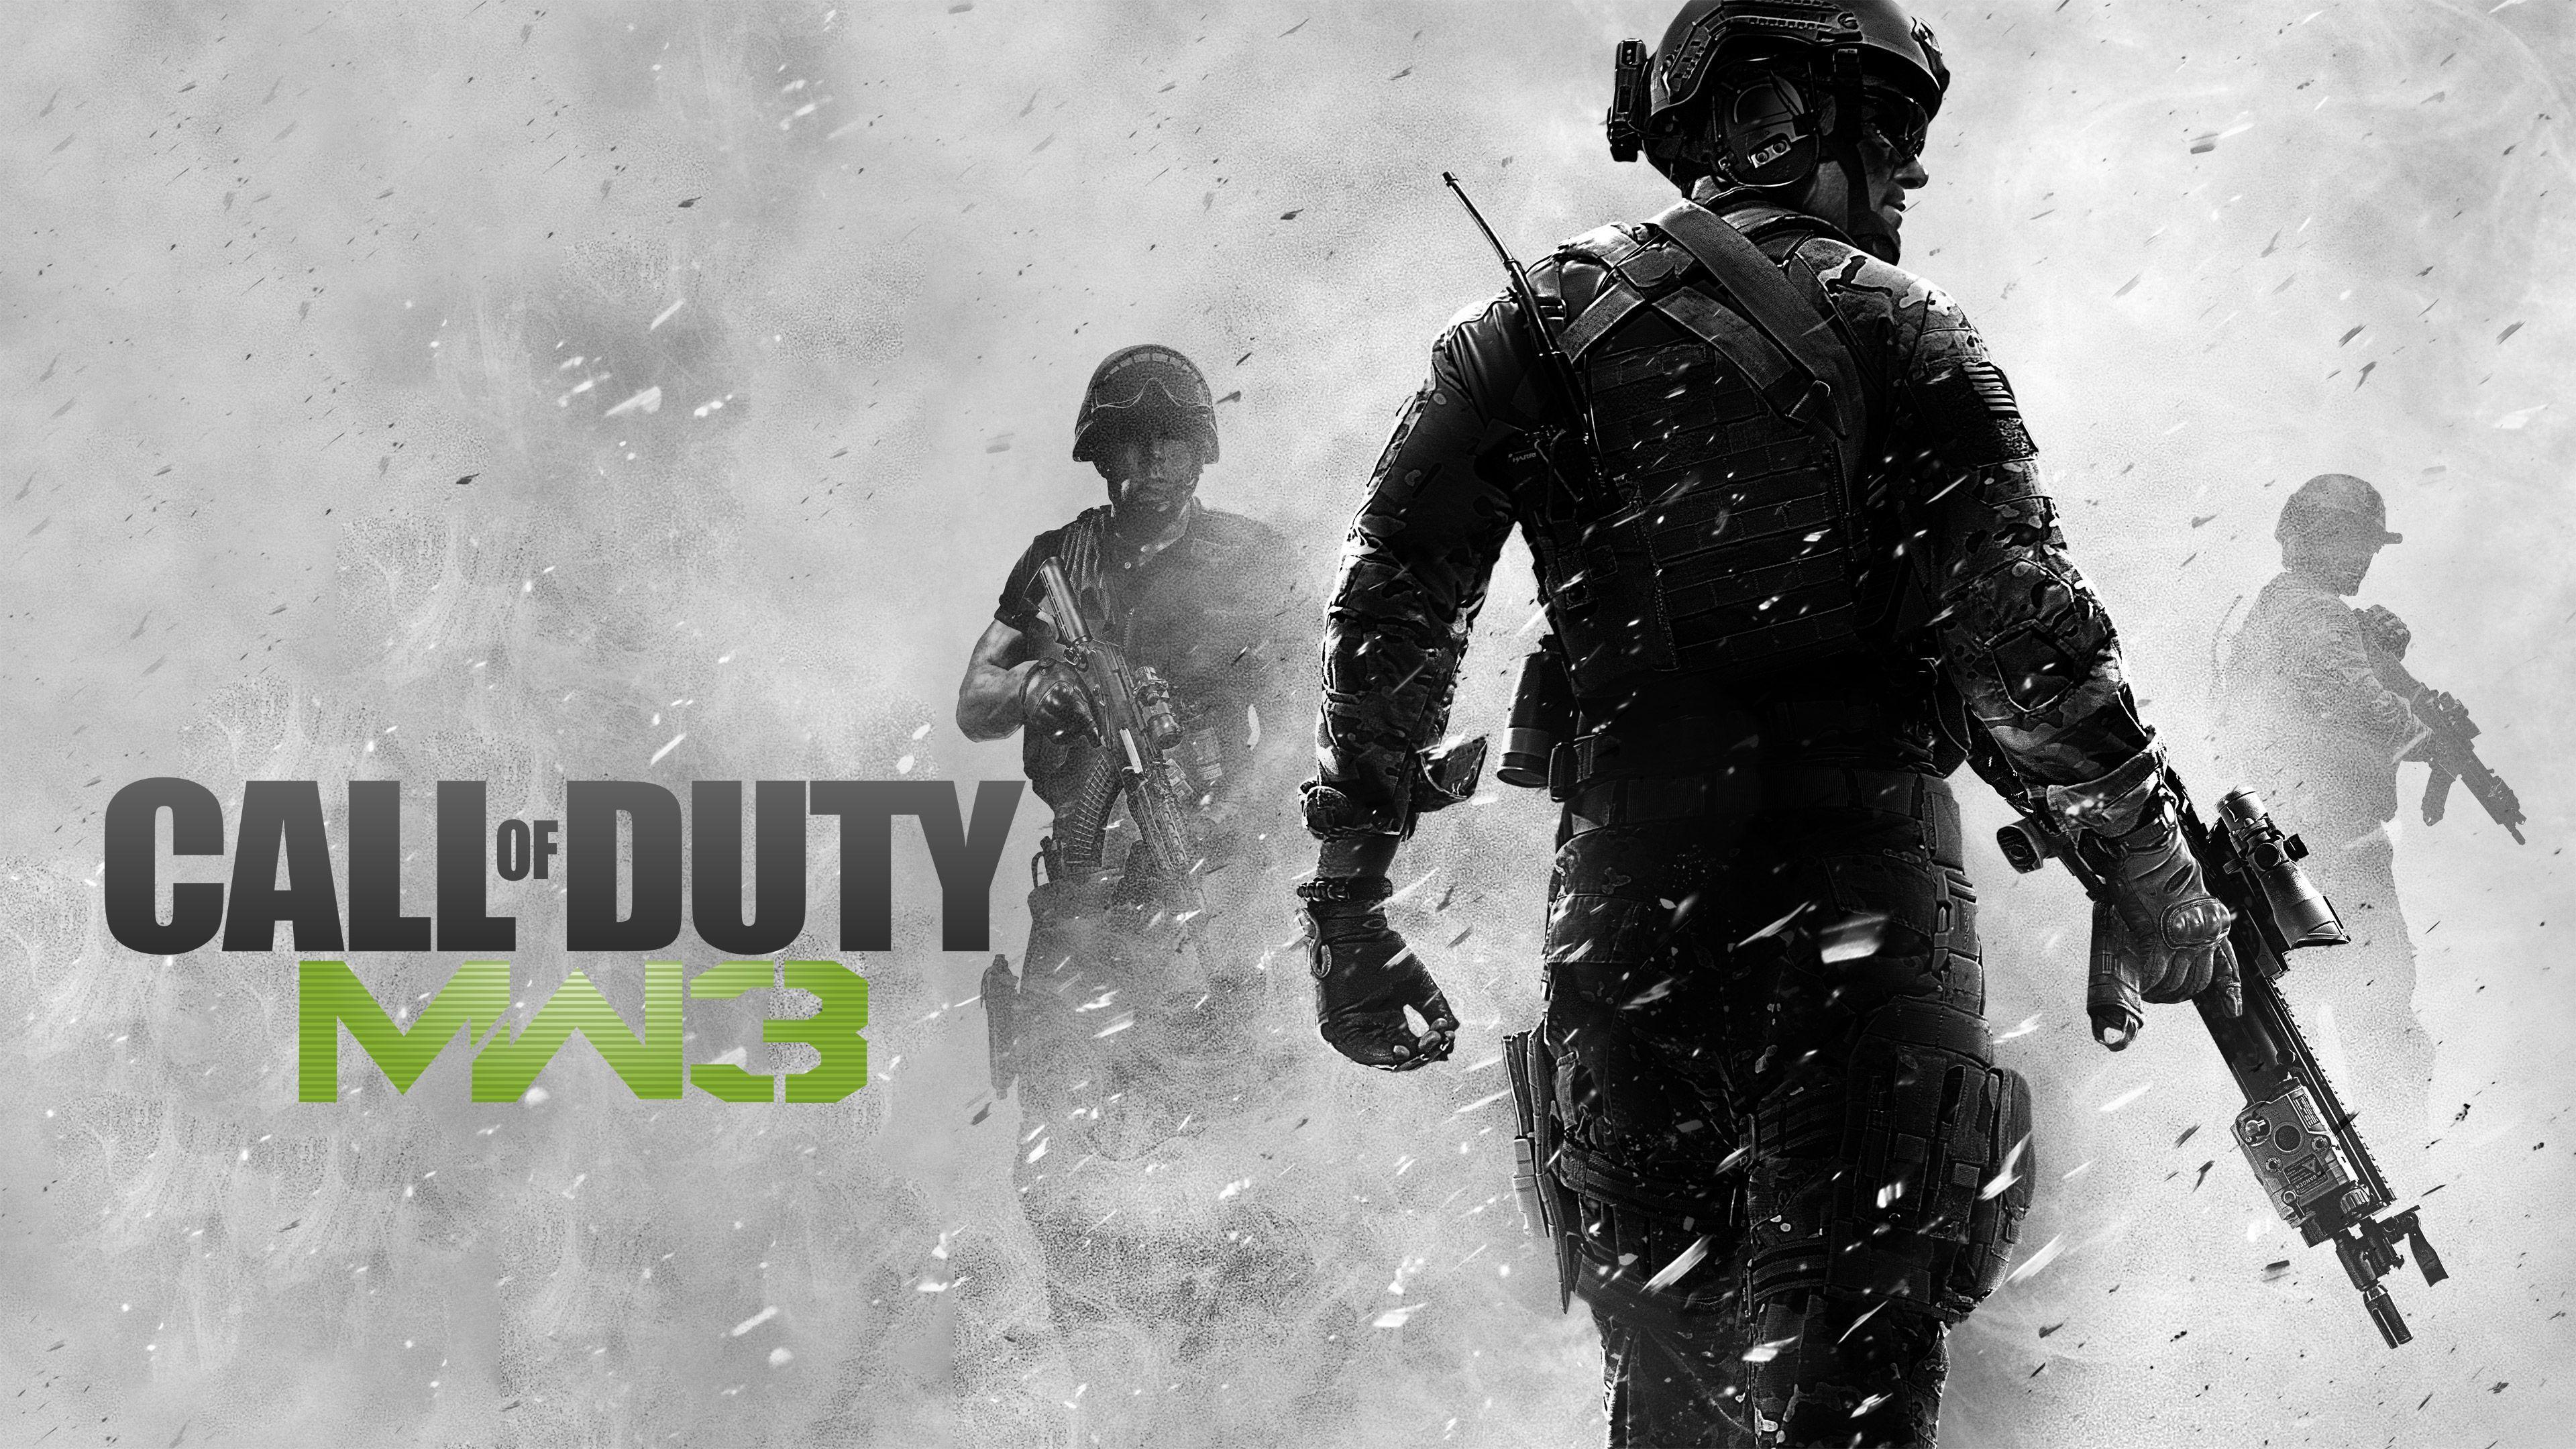 Call Of Duty Modern Warfare Wallpapers Top Free Call Of Duty Modern Warfare Backgrounds Wallpaperaccess